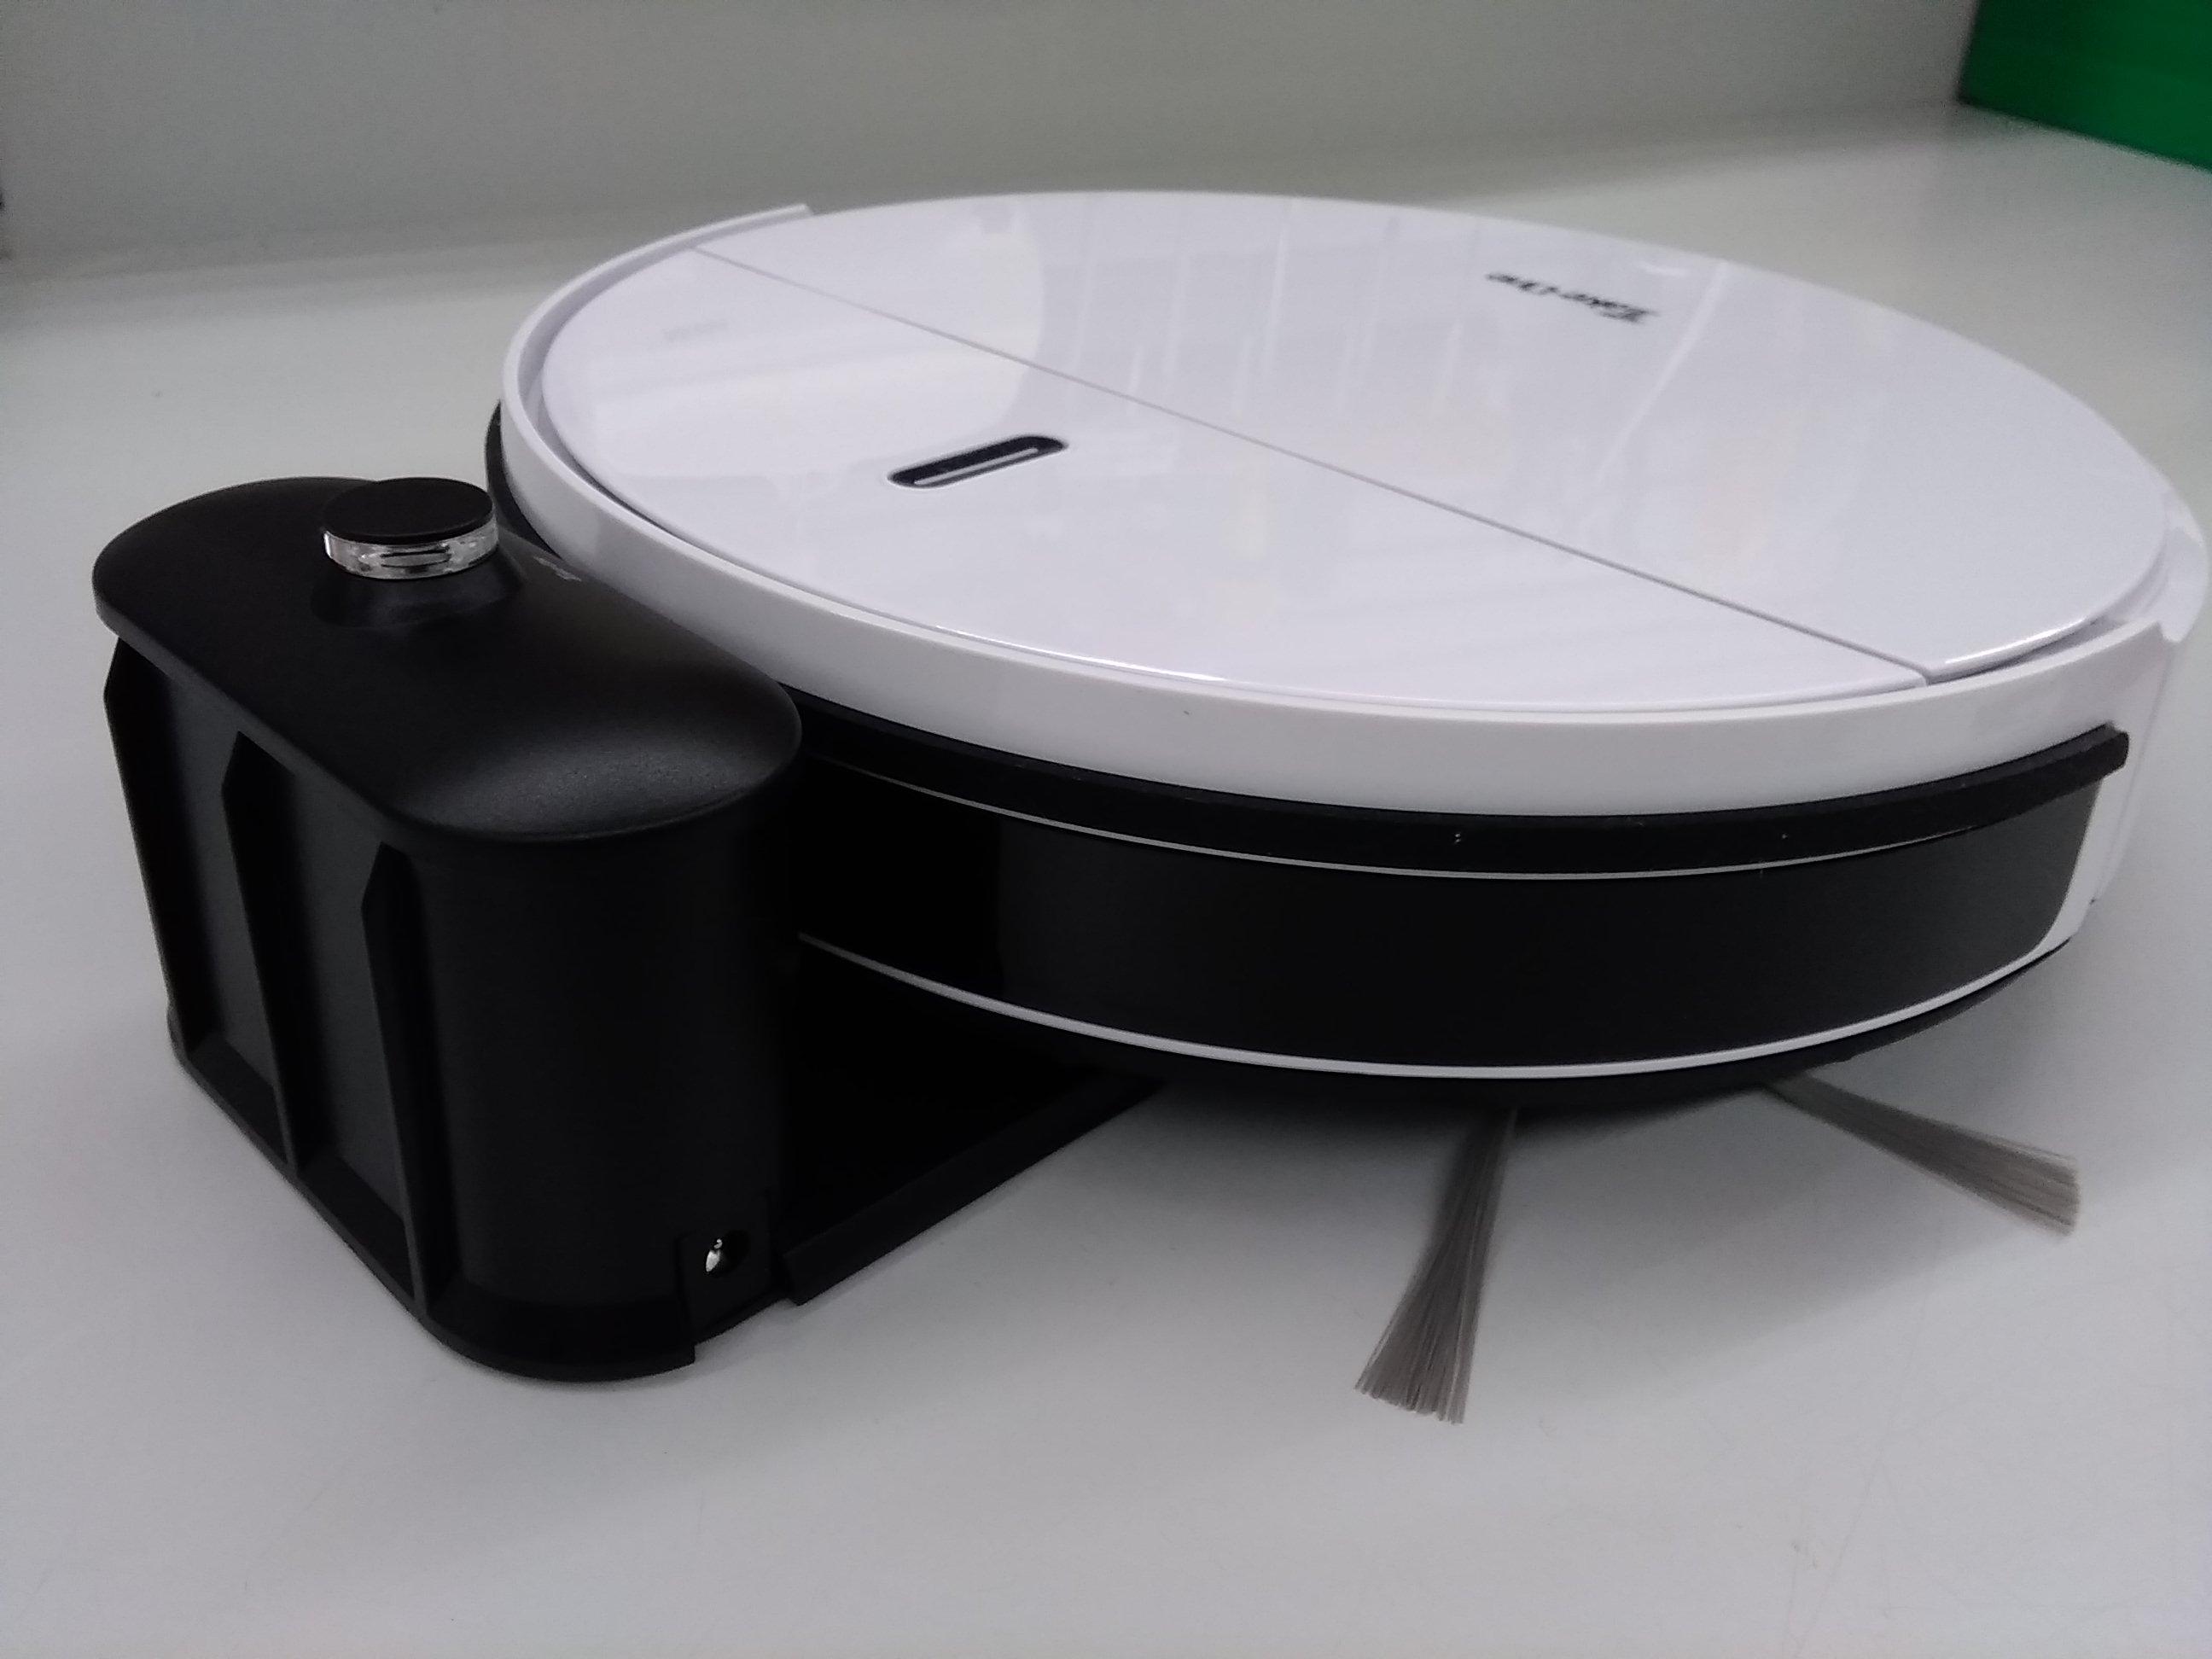 TAKE ONE X2 ロボット掃除機|テイクワンテクノロジー